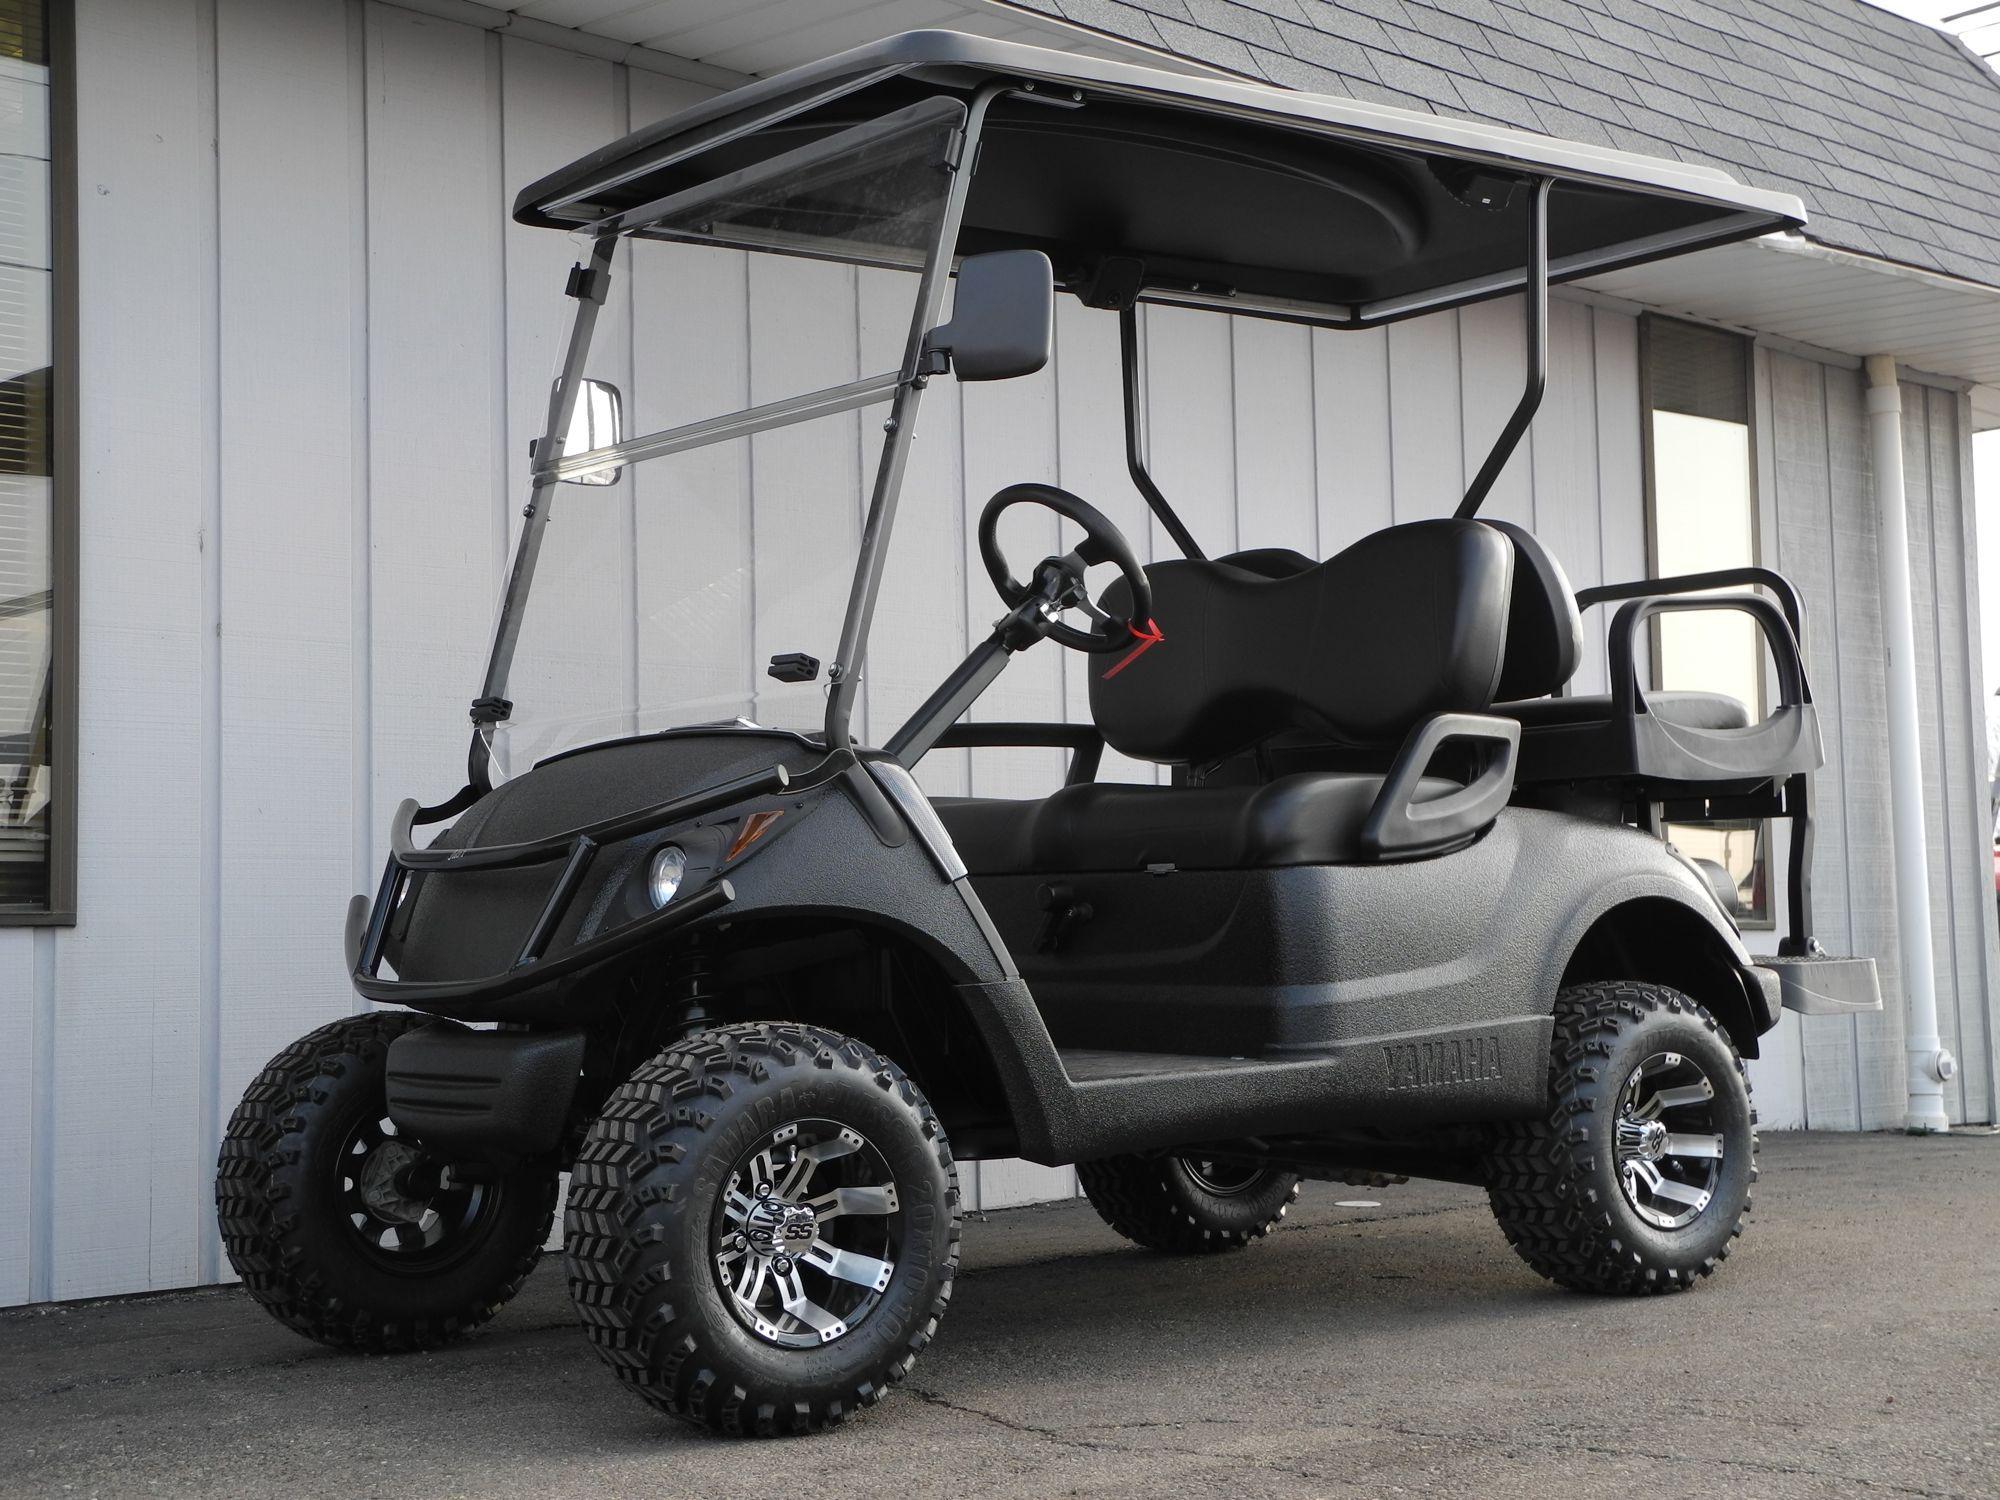 Build Your Own Golf Cart Kit >> 23 Best Golf Cart Images On Pinterest Golf Cart Bodies Ab